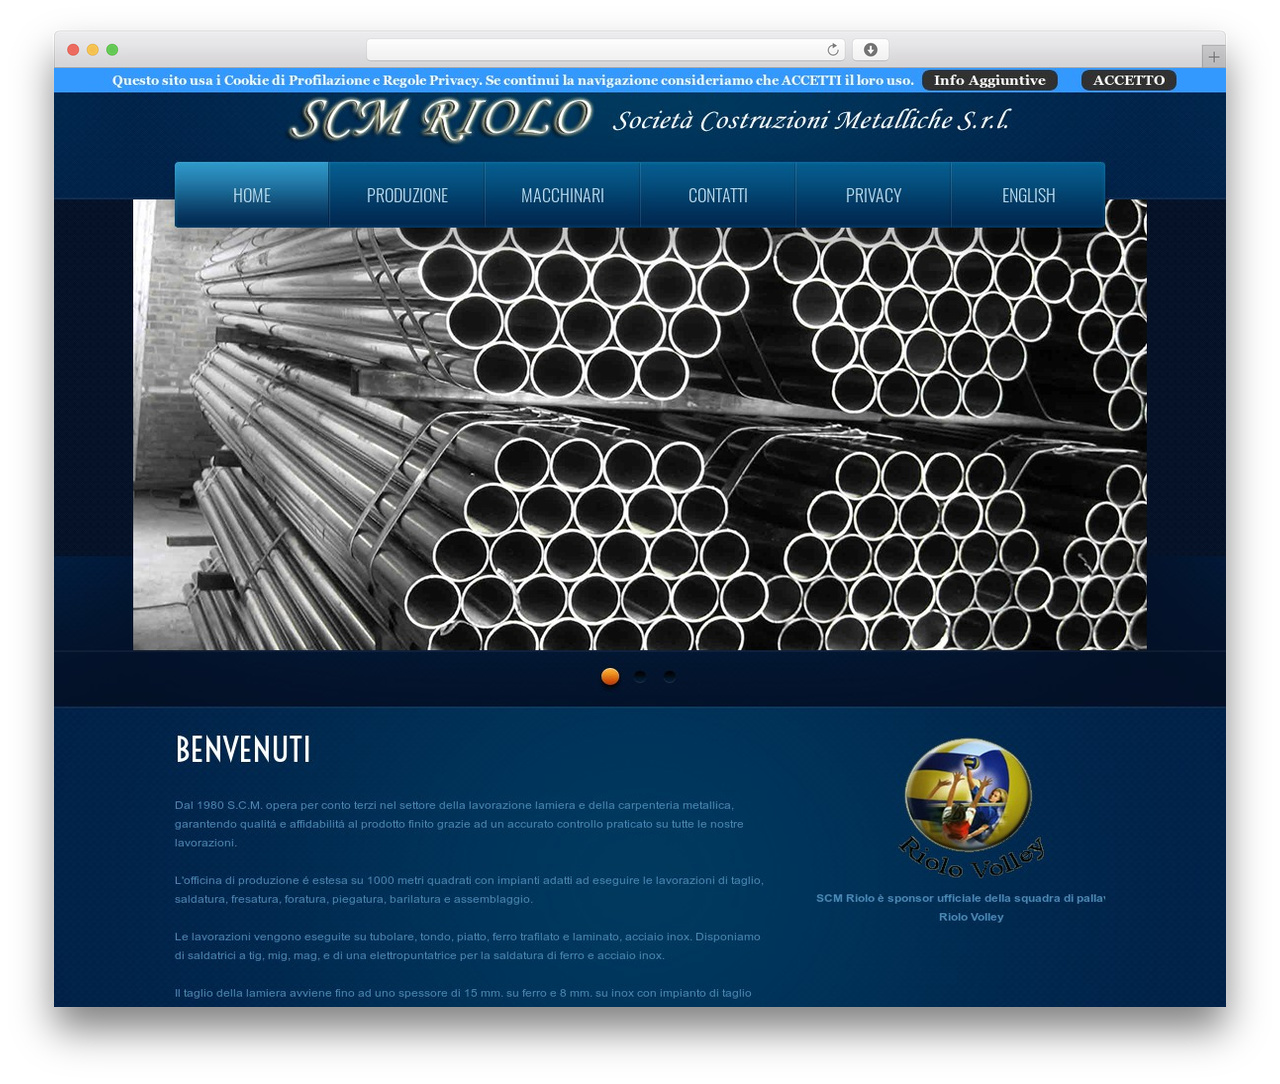 theme1866 WordPress template - scmriolo.com